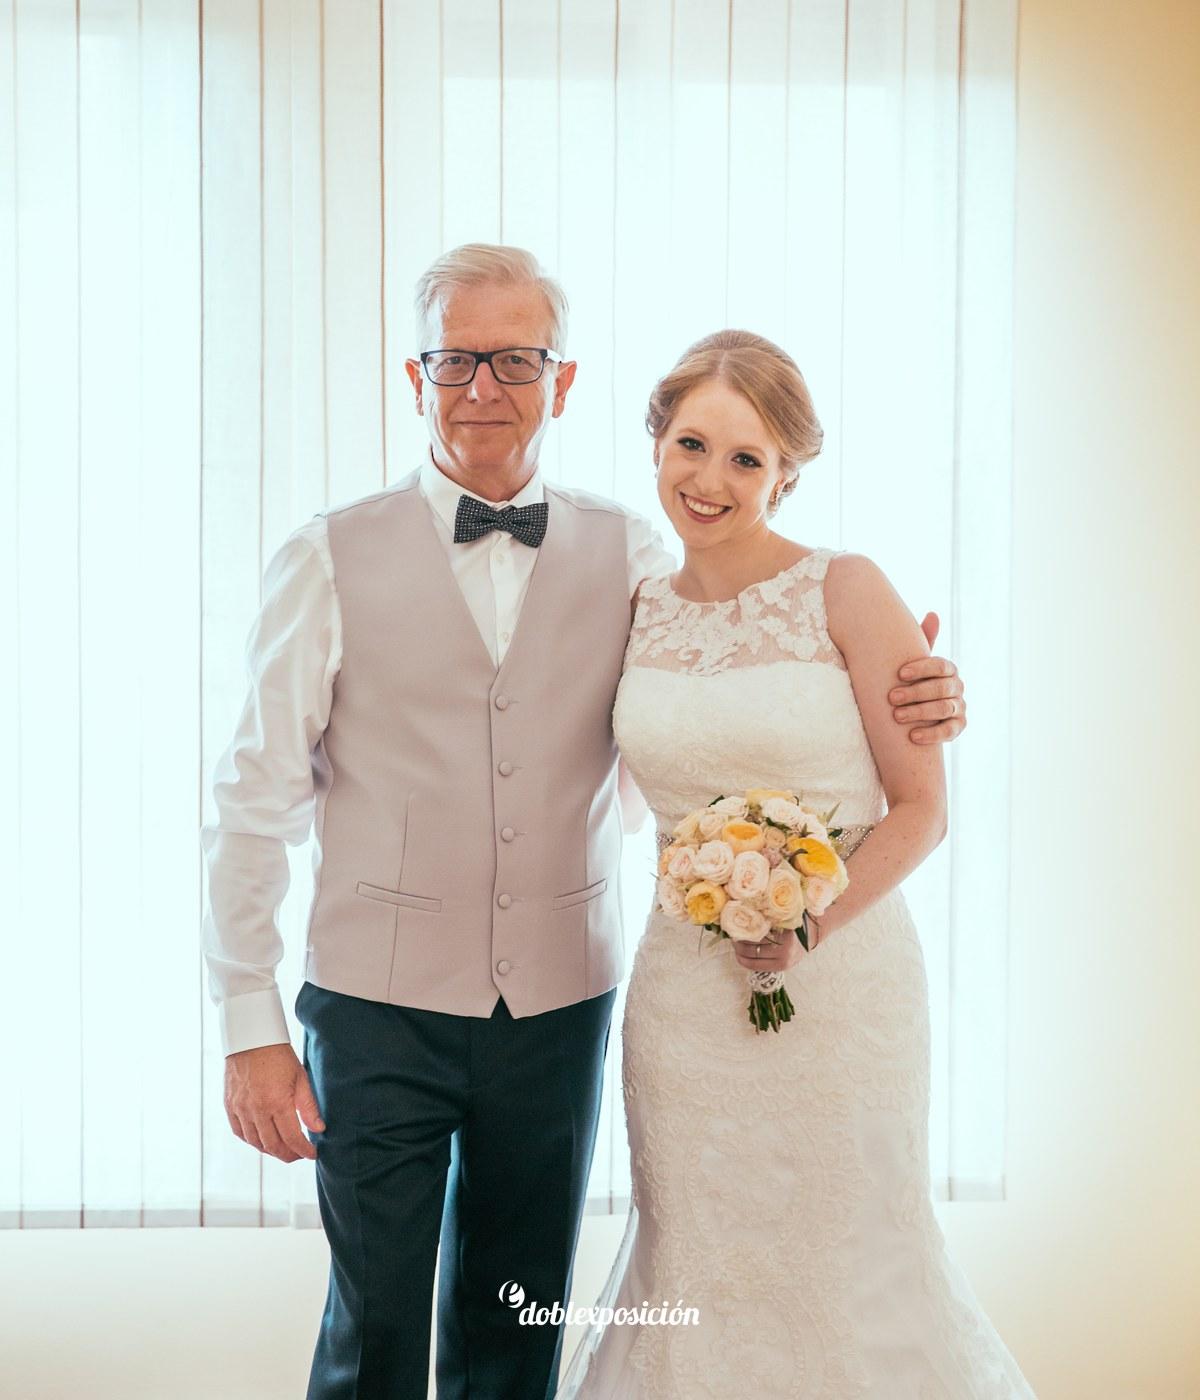 fotografos-boda-campo-masia-finca-el-lago-elche-alicante_0010